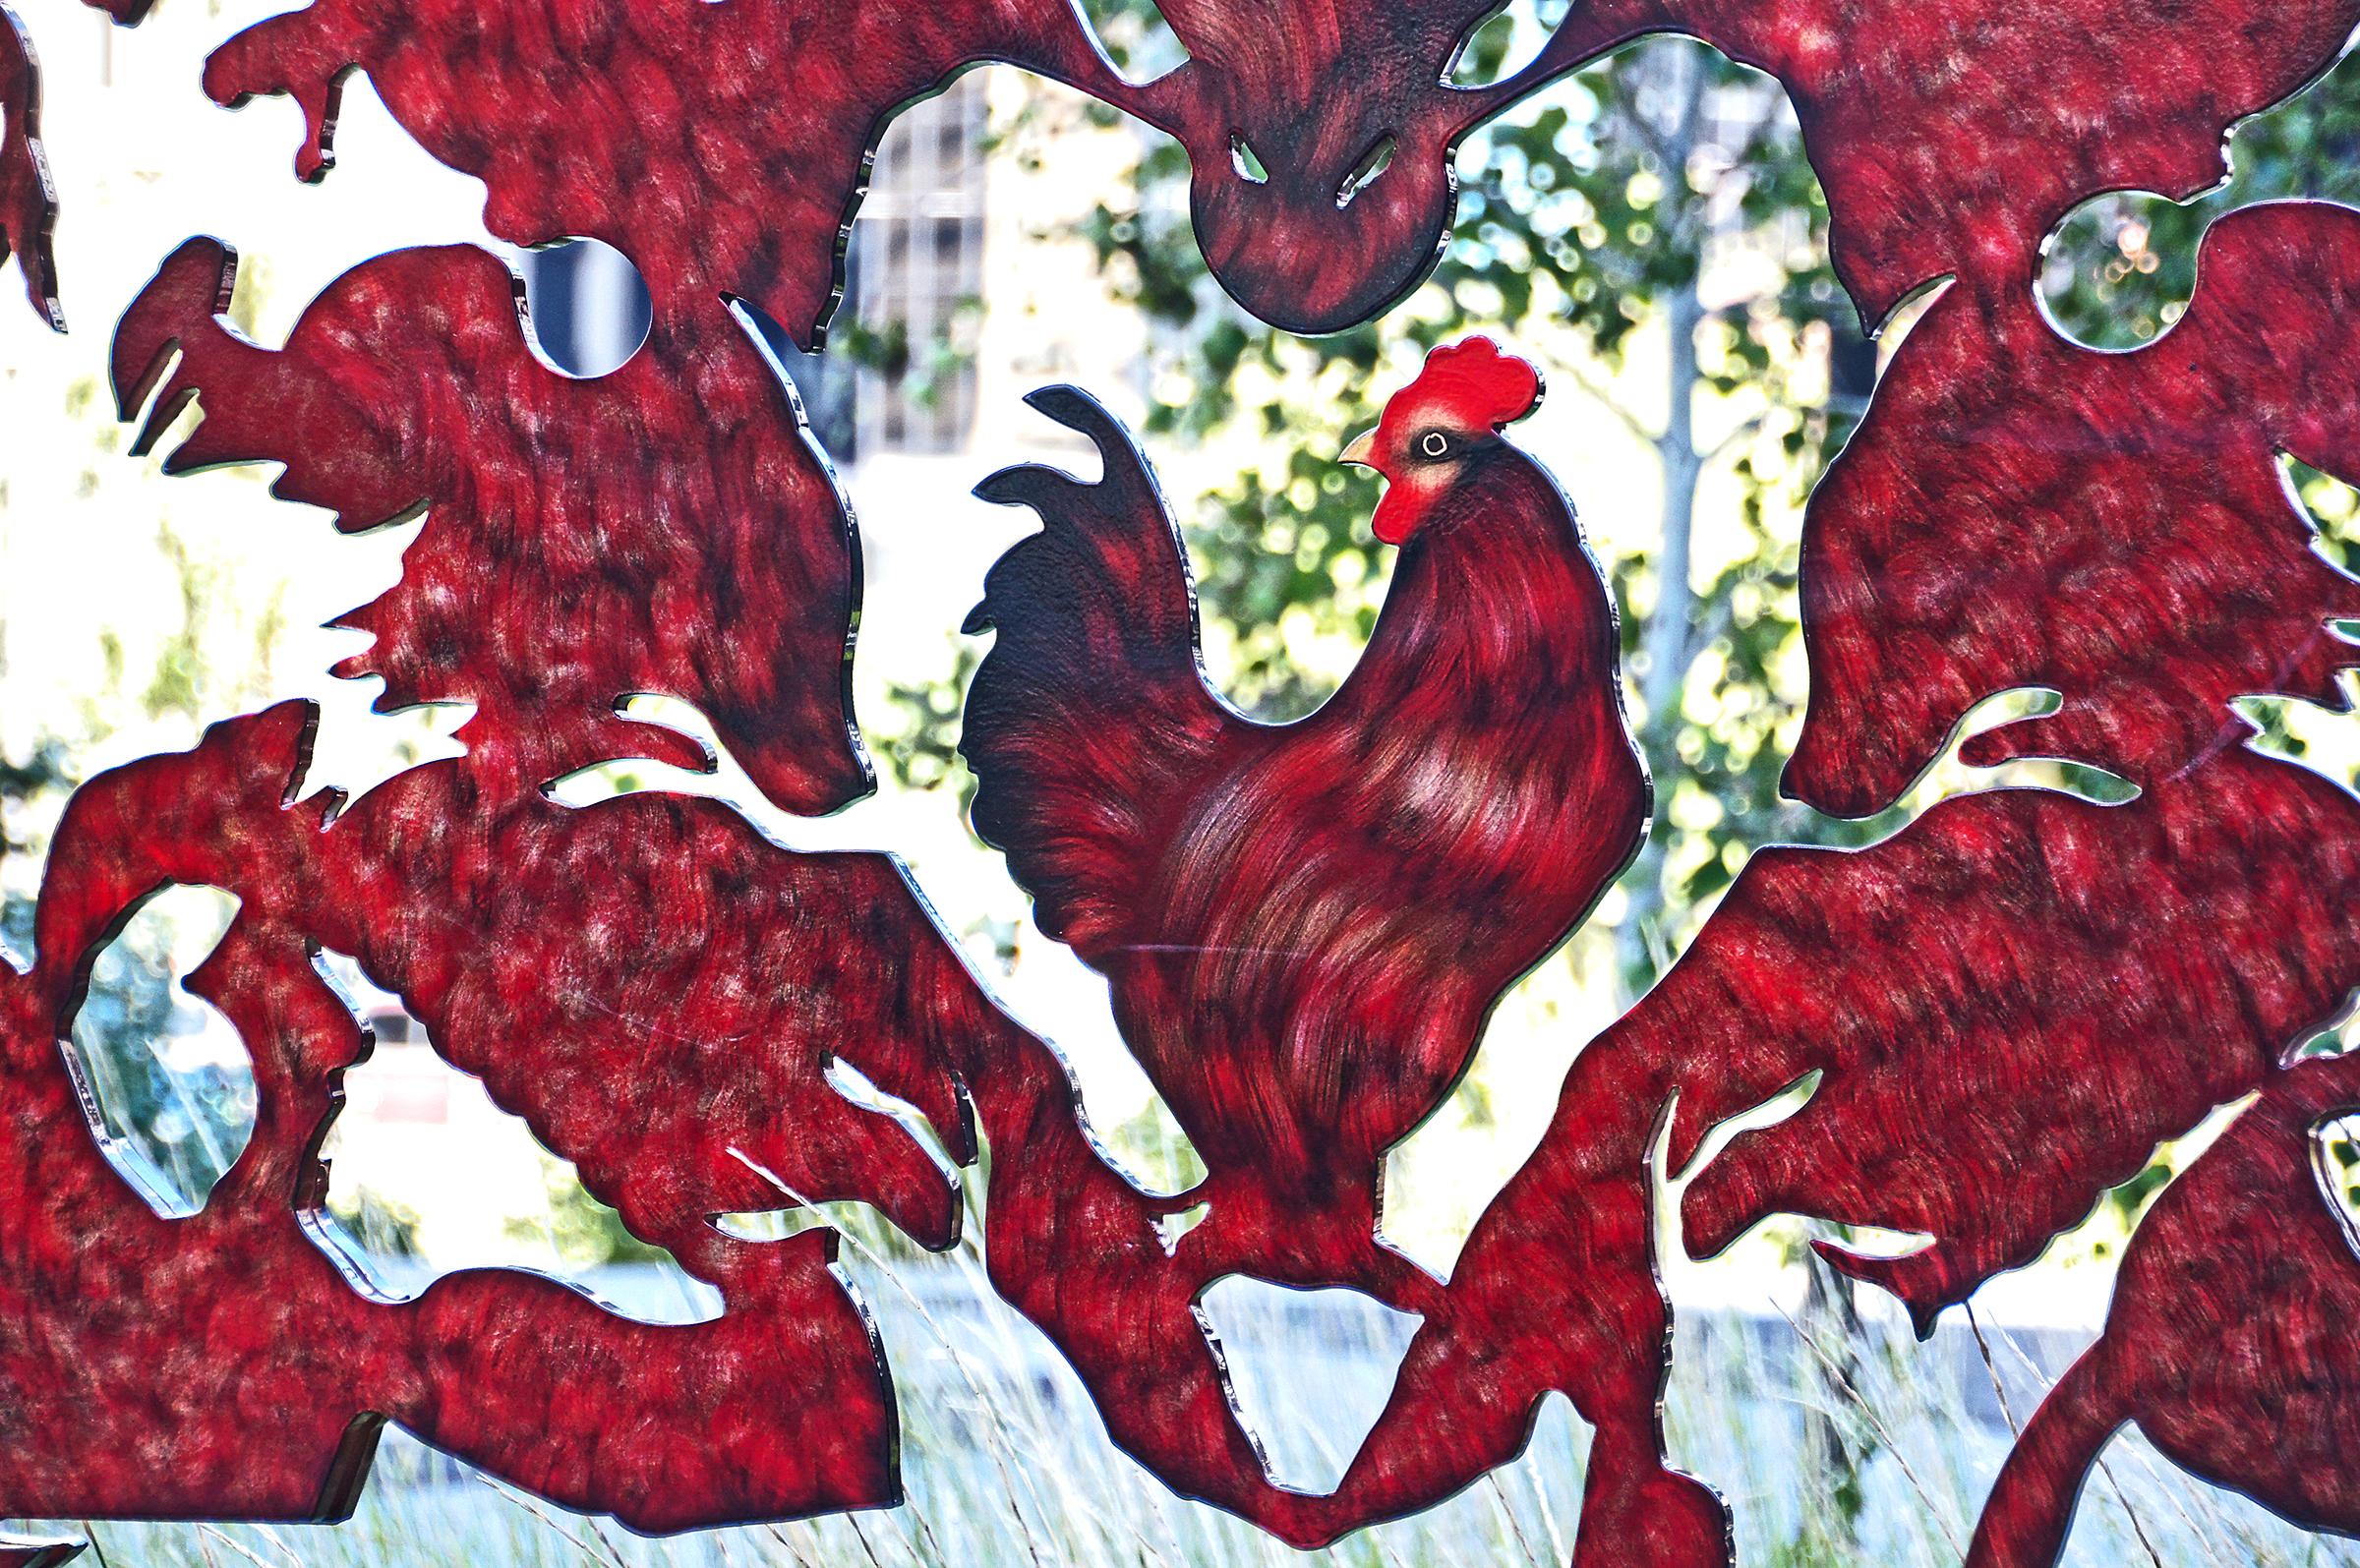 Gambar Bunga Pola Merah Ayam Jantan Ilustrasi Budaya Sony